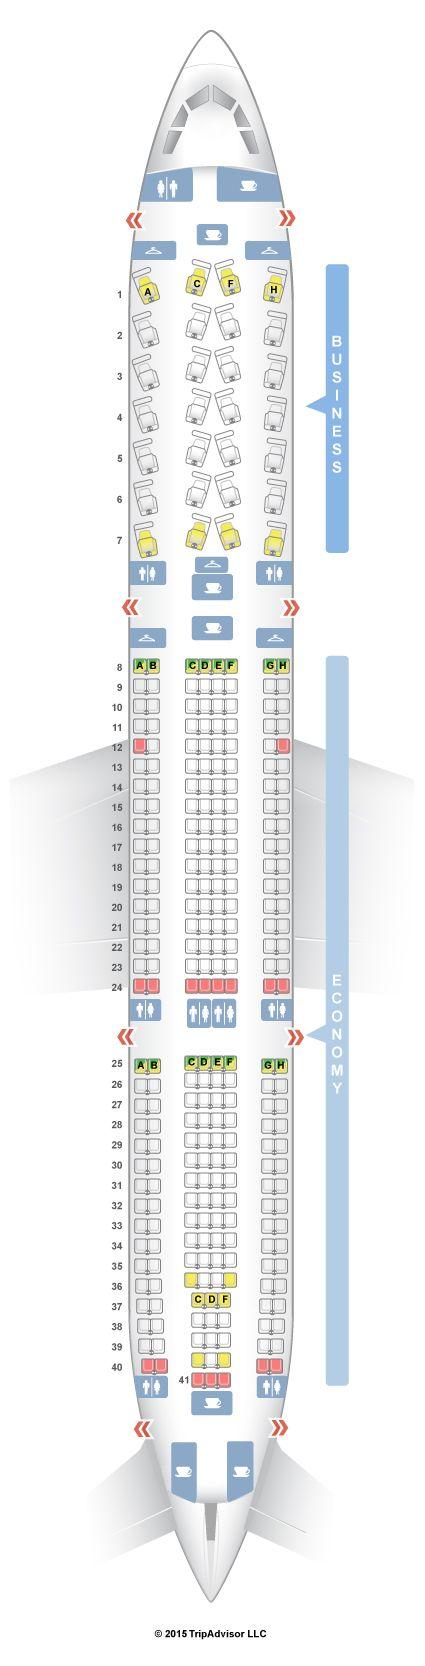 SeatGuru Seat Map American Airlines Airbus A330-300 (333)